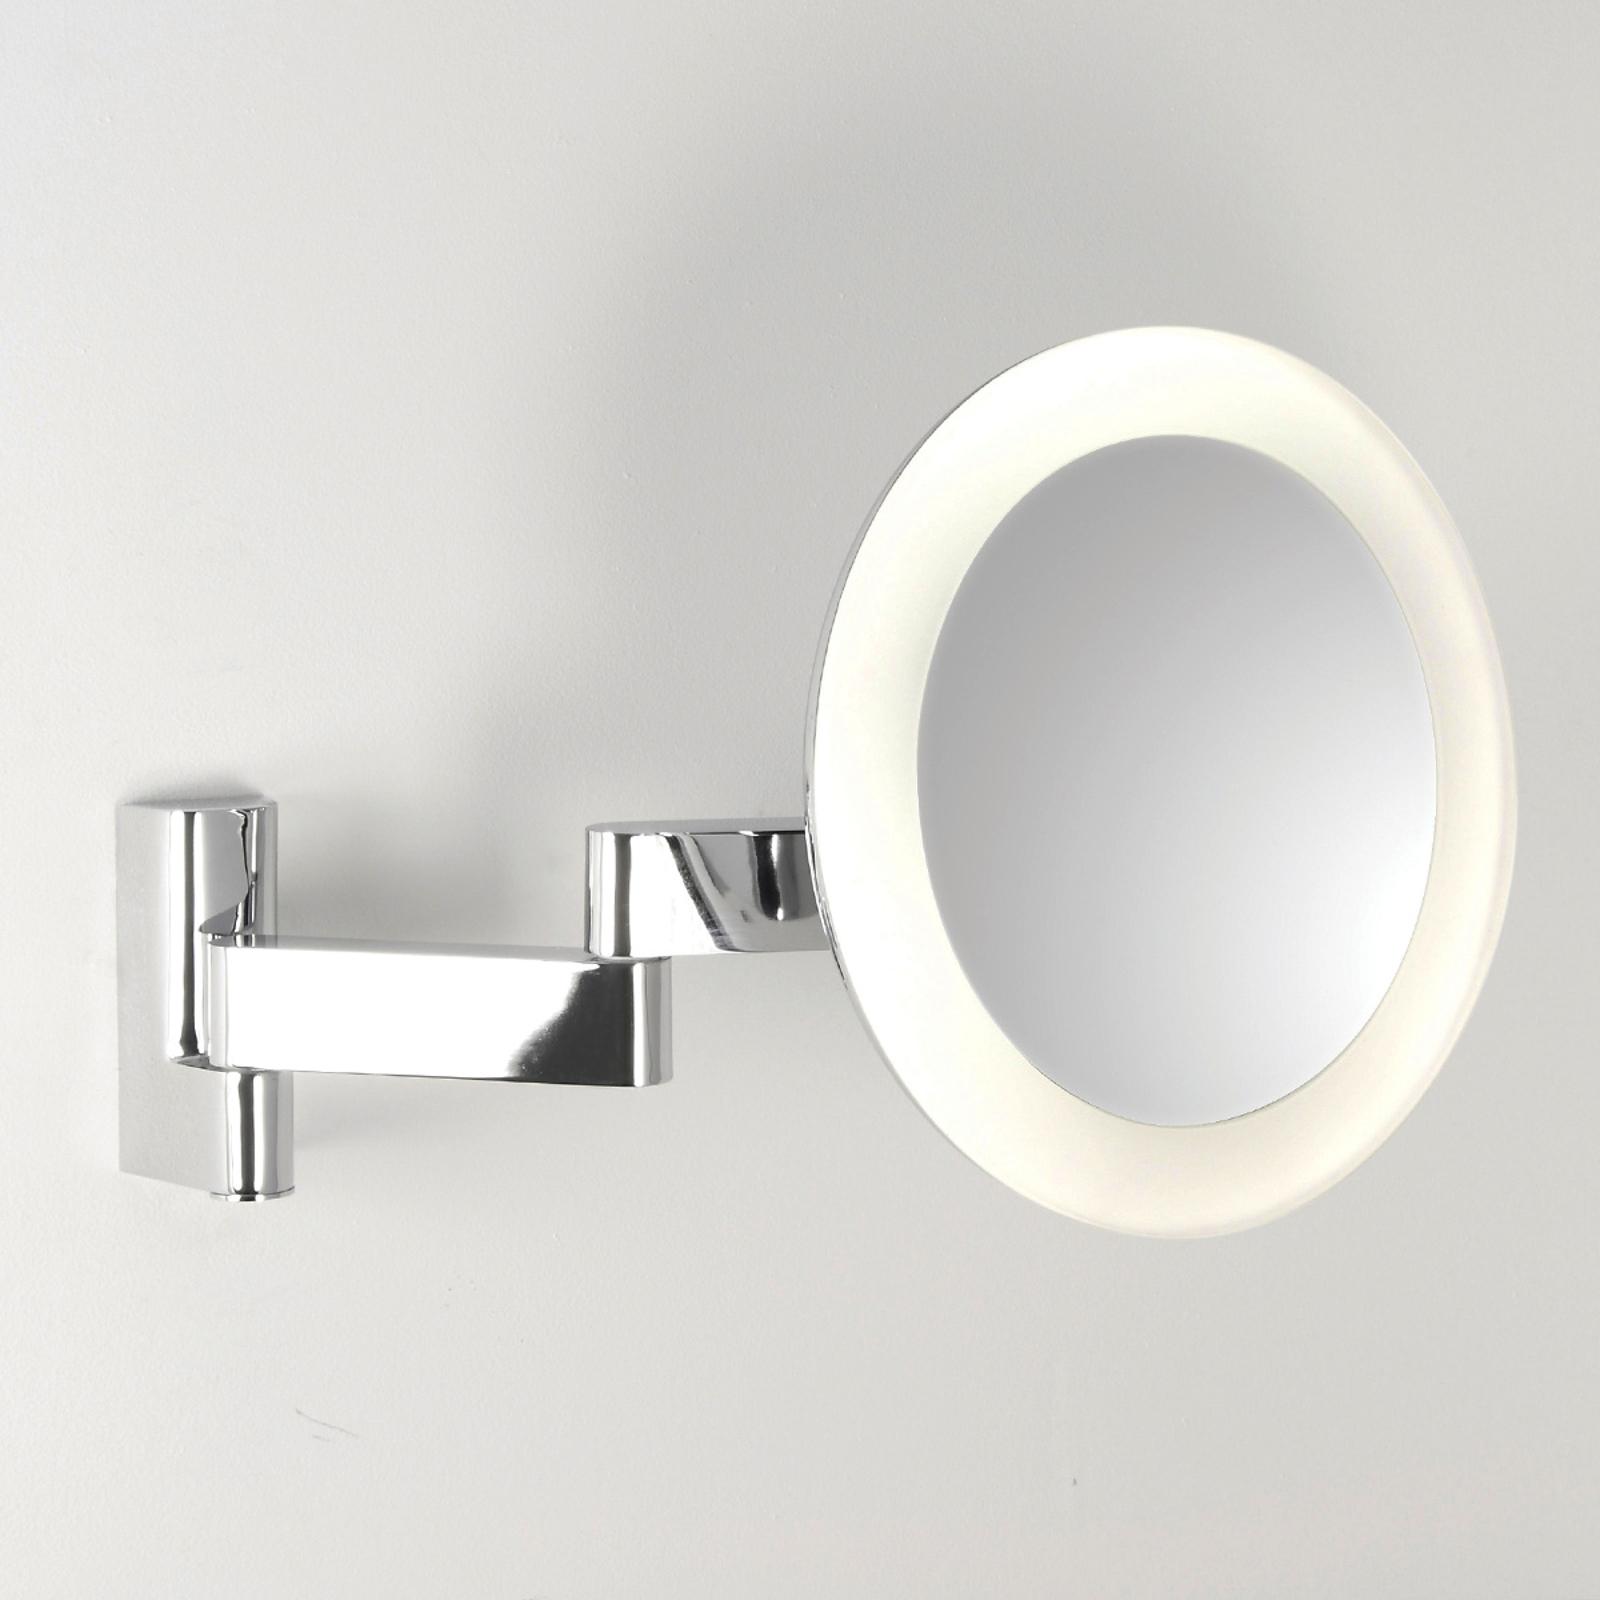 Sminkspegel NIIMI ROUND med LED-belysning